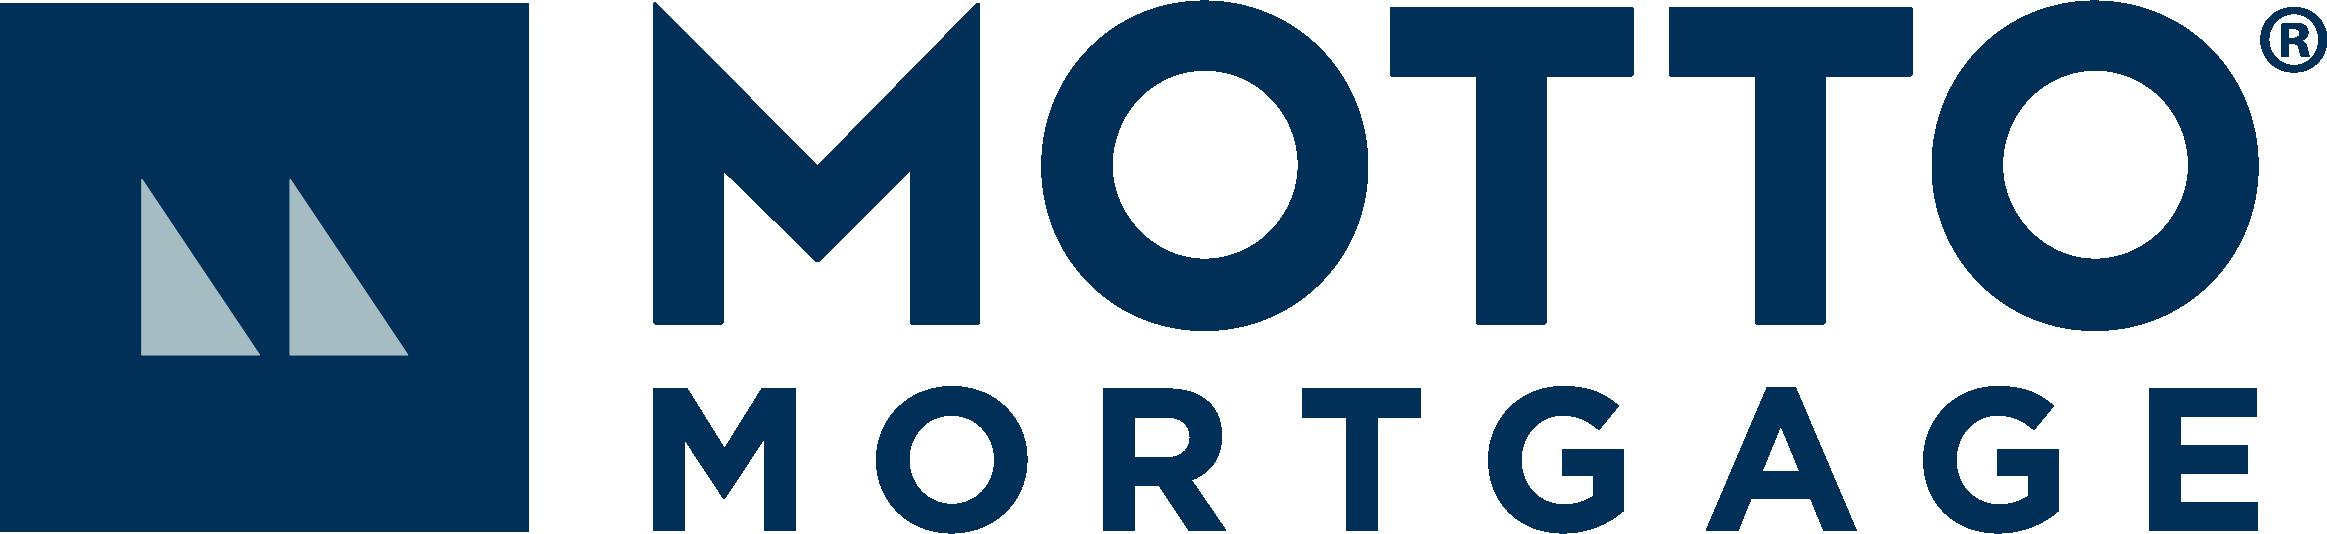 Motto Mortgage Results